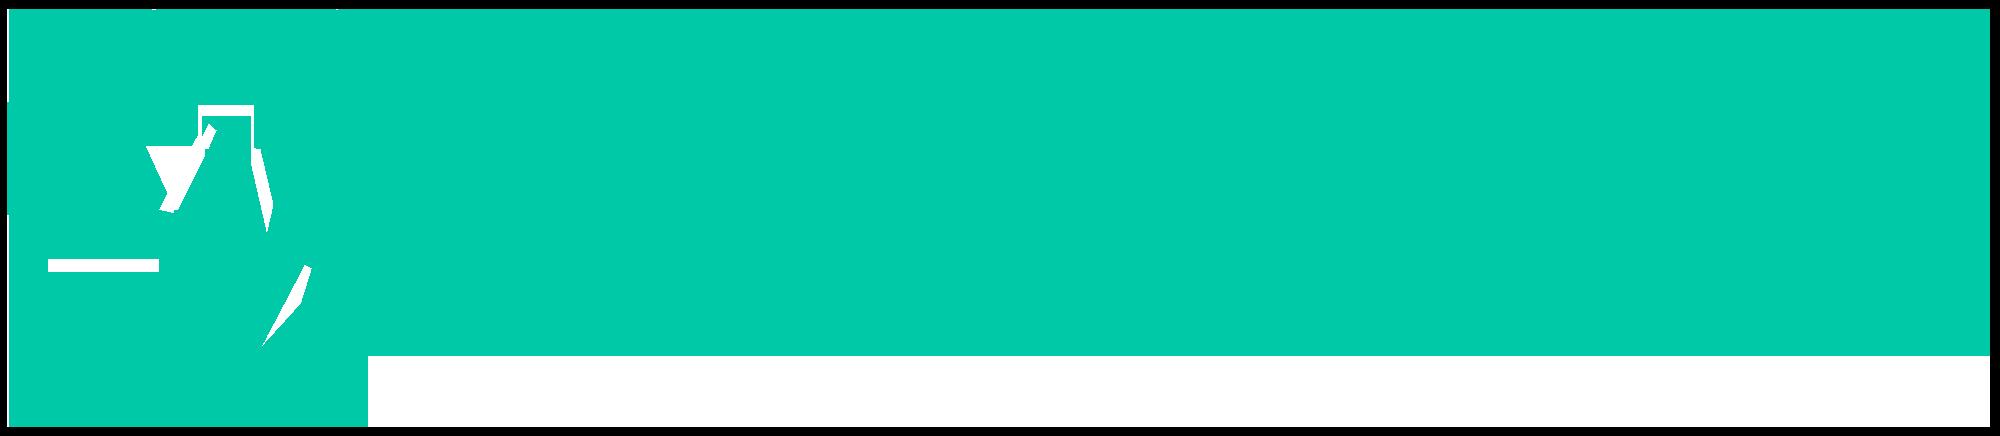 hoiwa-logo-medium-fixedheart